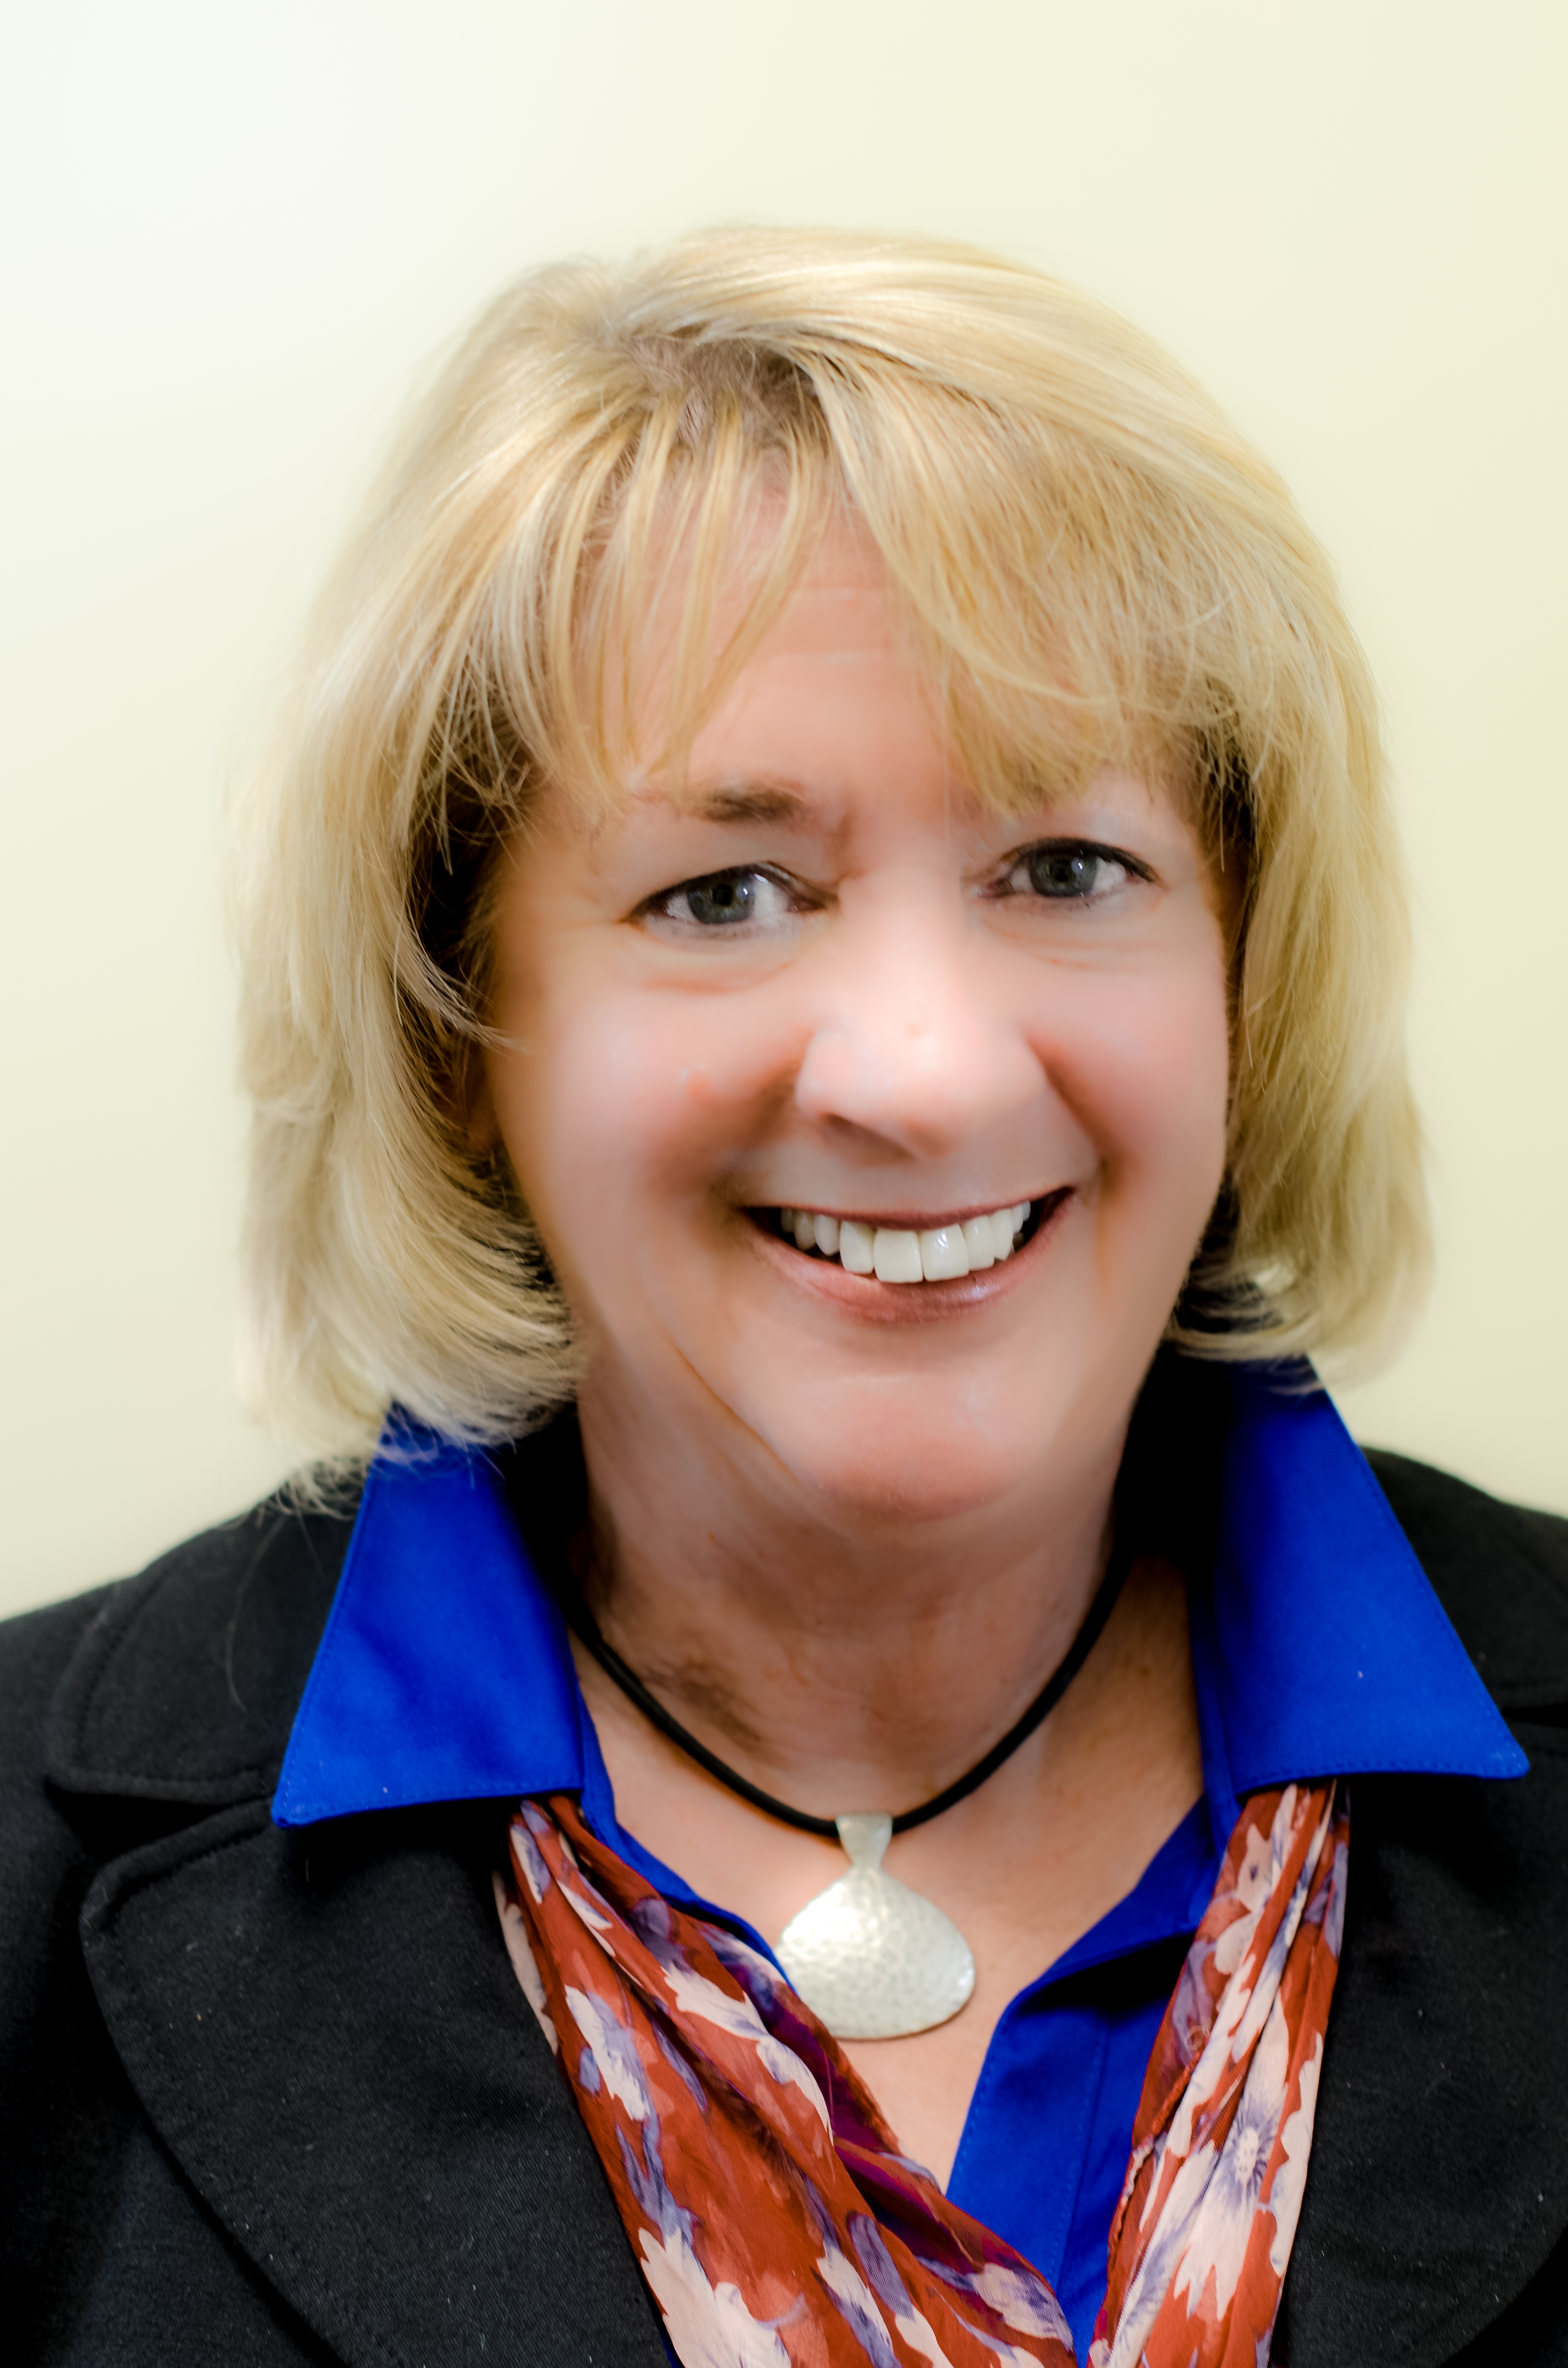 General Hospital Carol Banks Weber - Alice o hare weber accountant